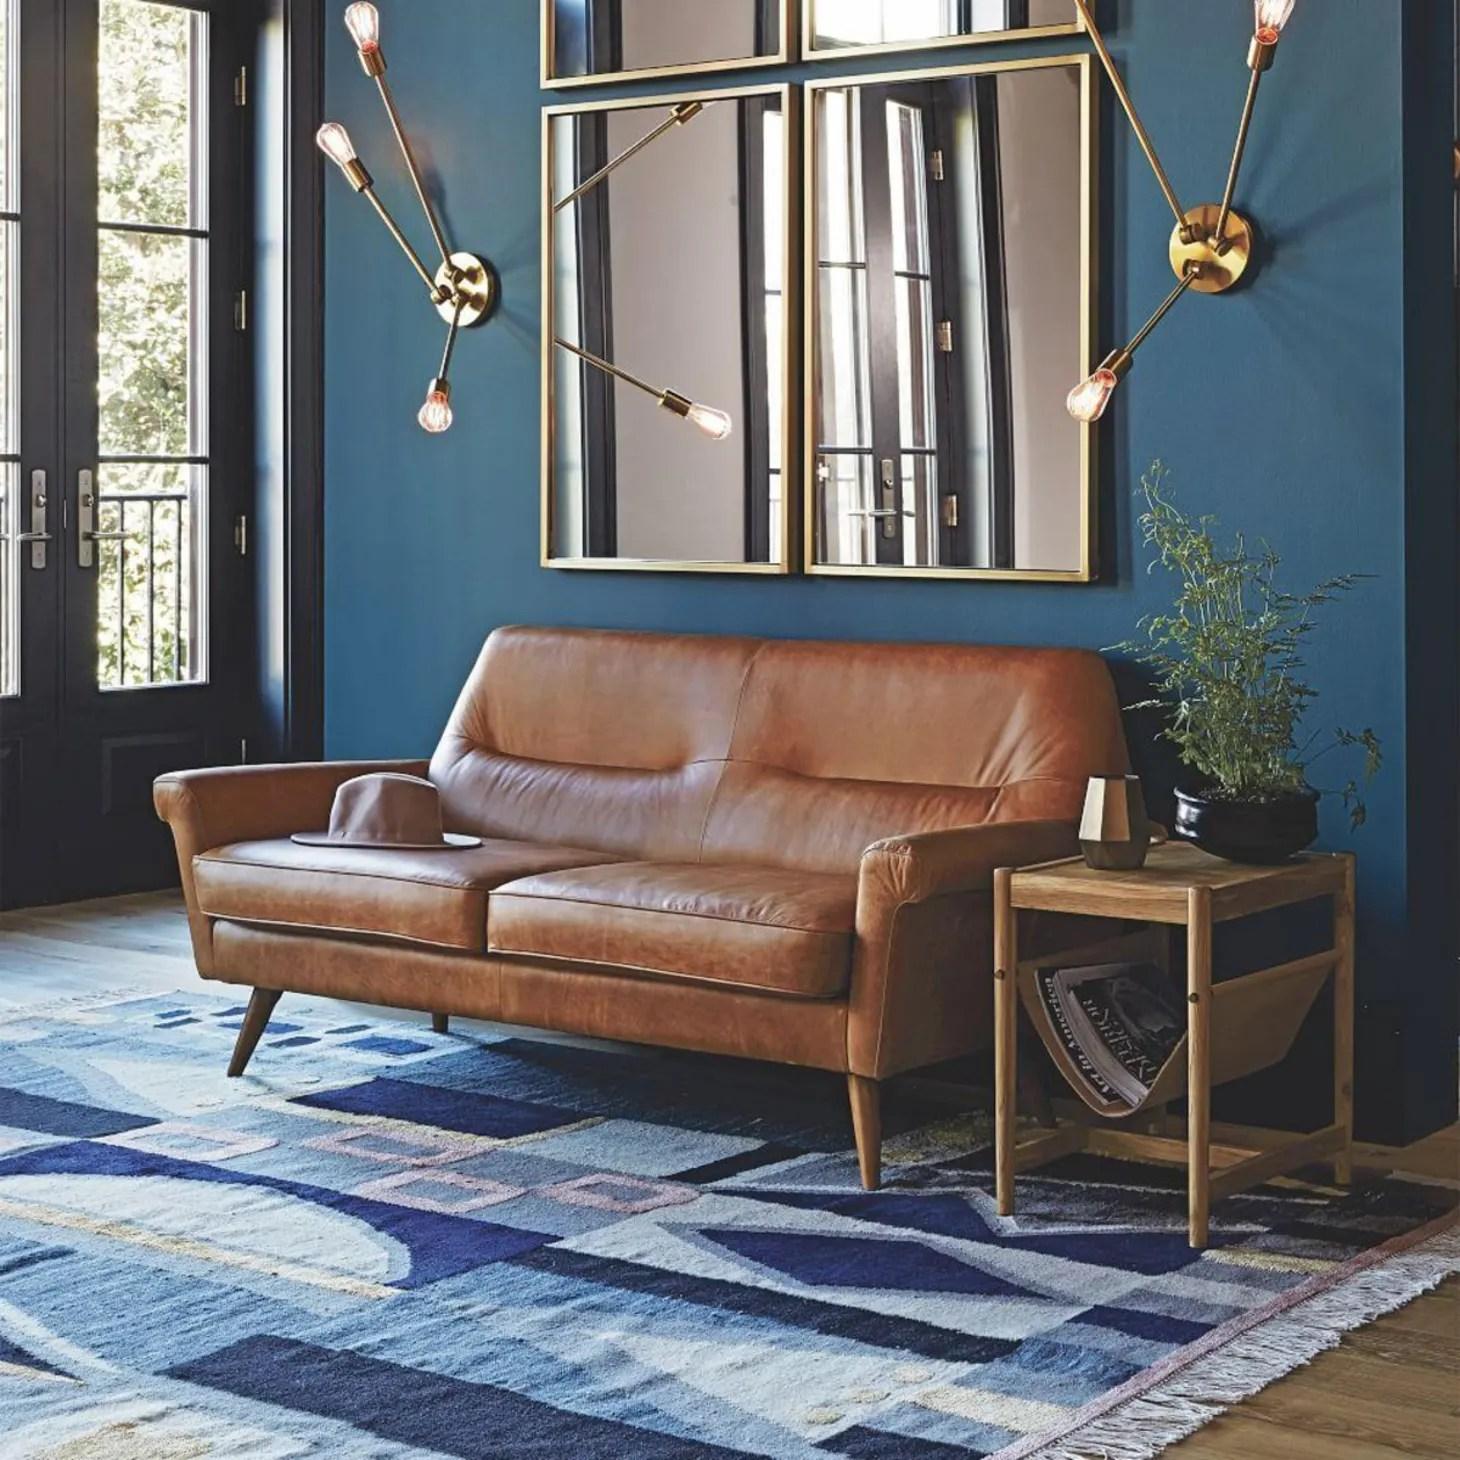 30 Small Living Room Decorating & Design Ideas - How to ... on Small Living Room Decor Ideas  id=57244